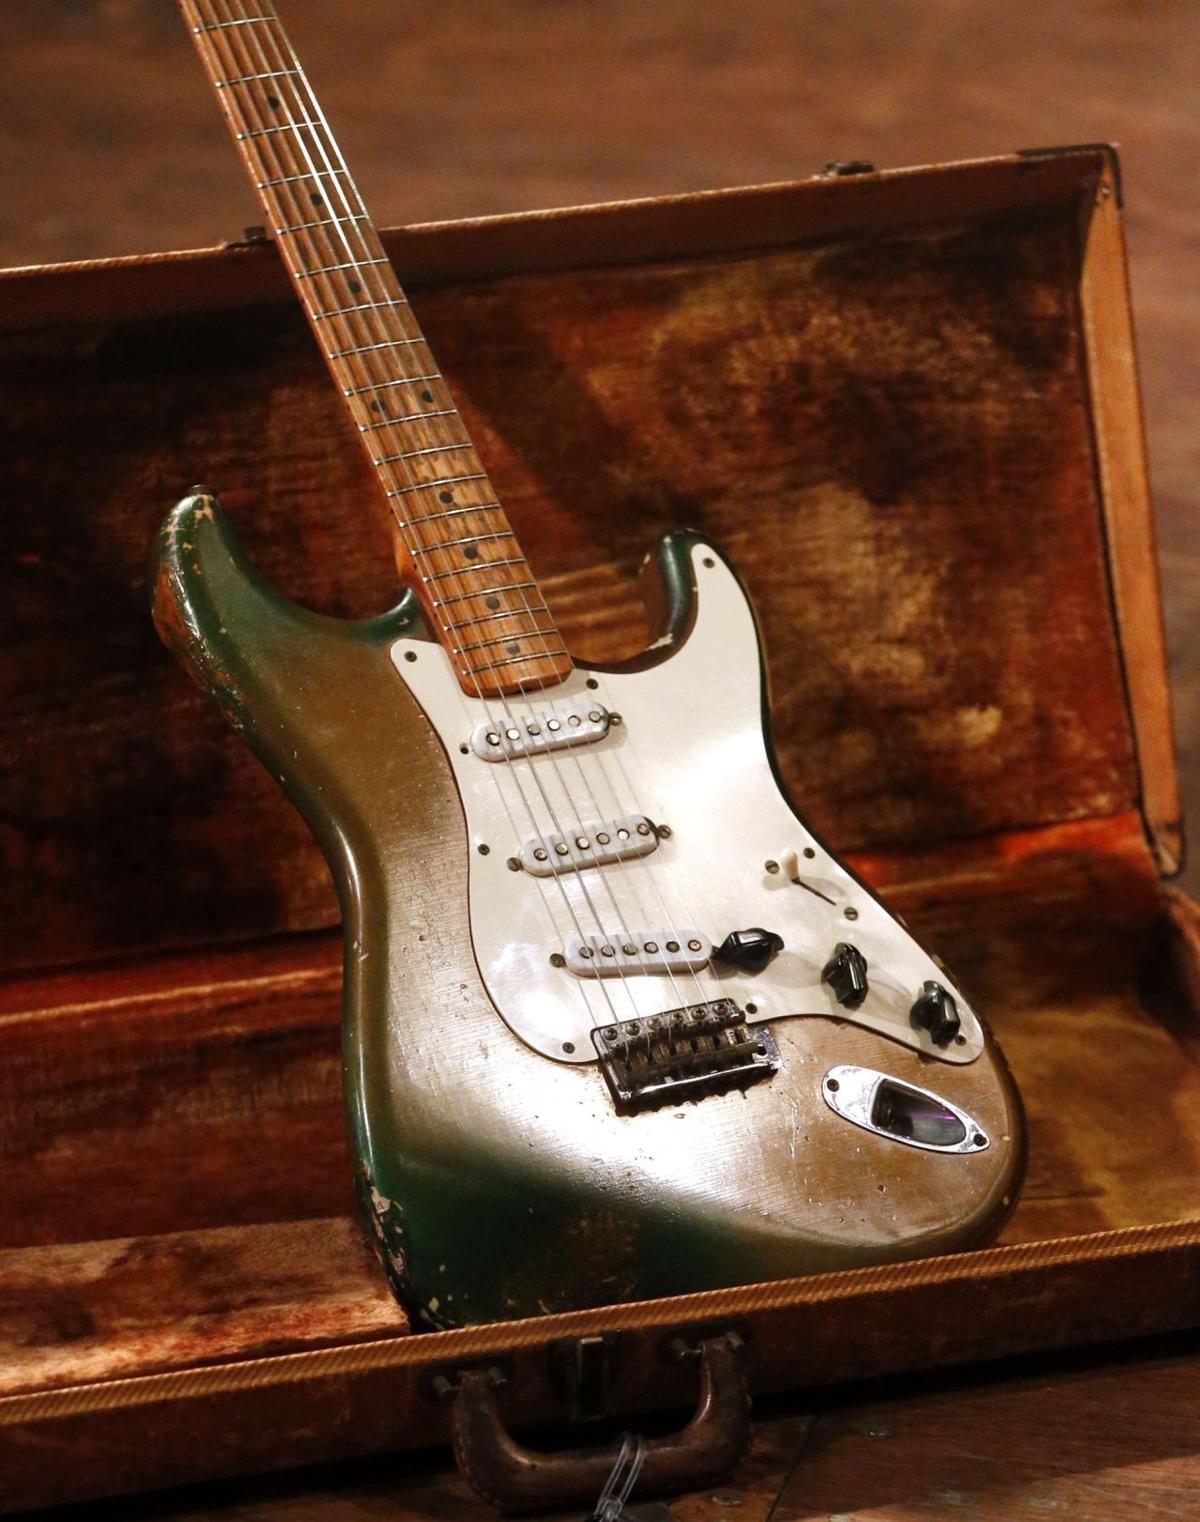 guitarist joe bonamassa brings texas playboys guitar back to cain 39 s ballroom blogs. Black Bedroom Furniture Sets. Home Design Ideas